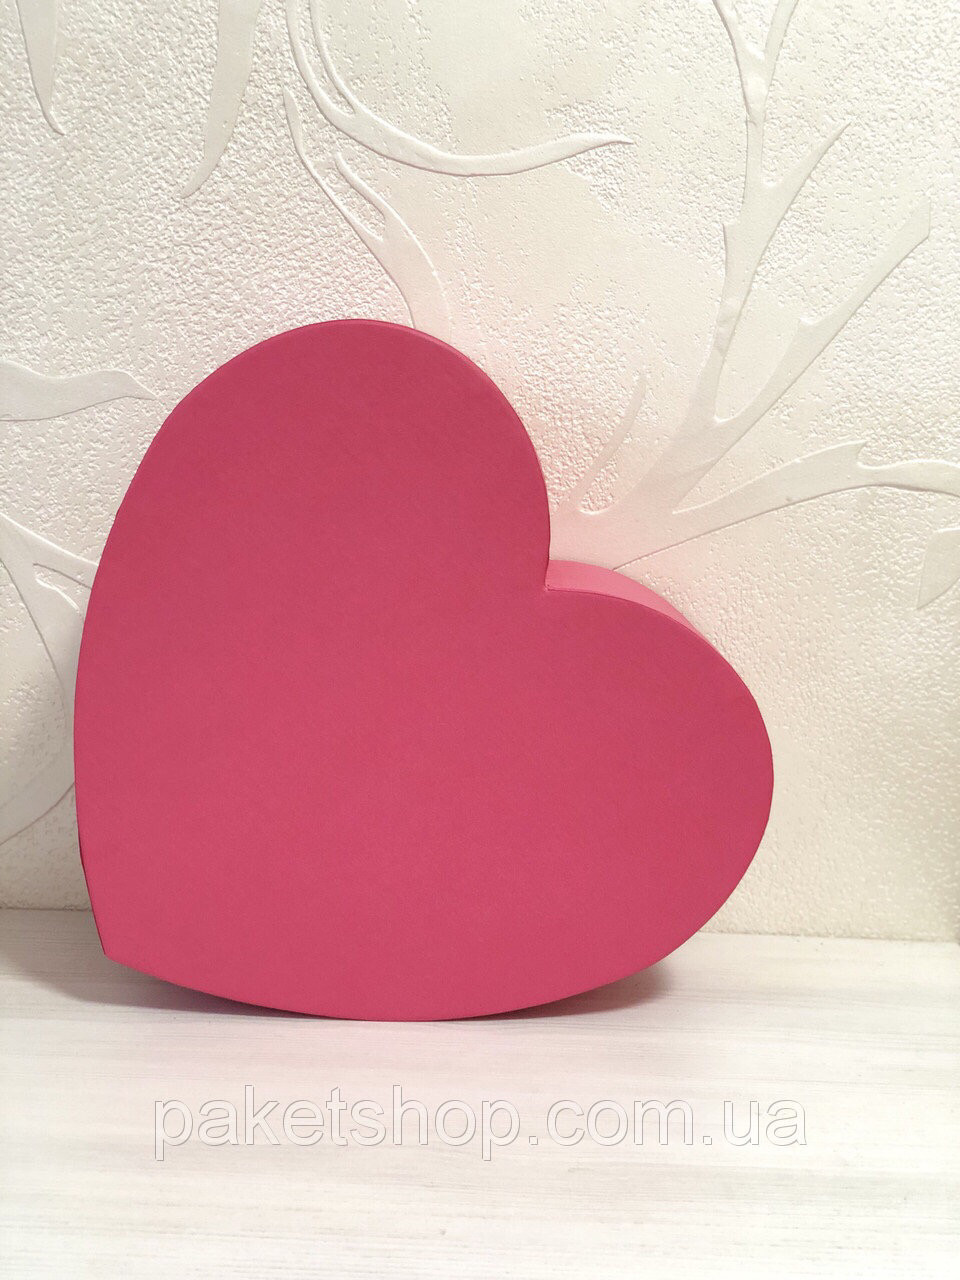 Подарочная картонная коробка ''Сердце'' 300*250*120